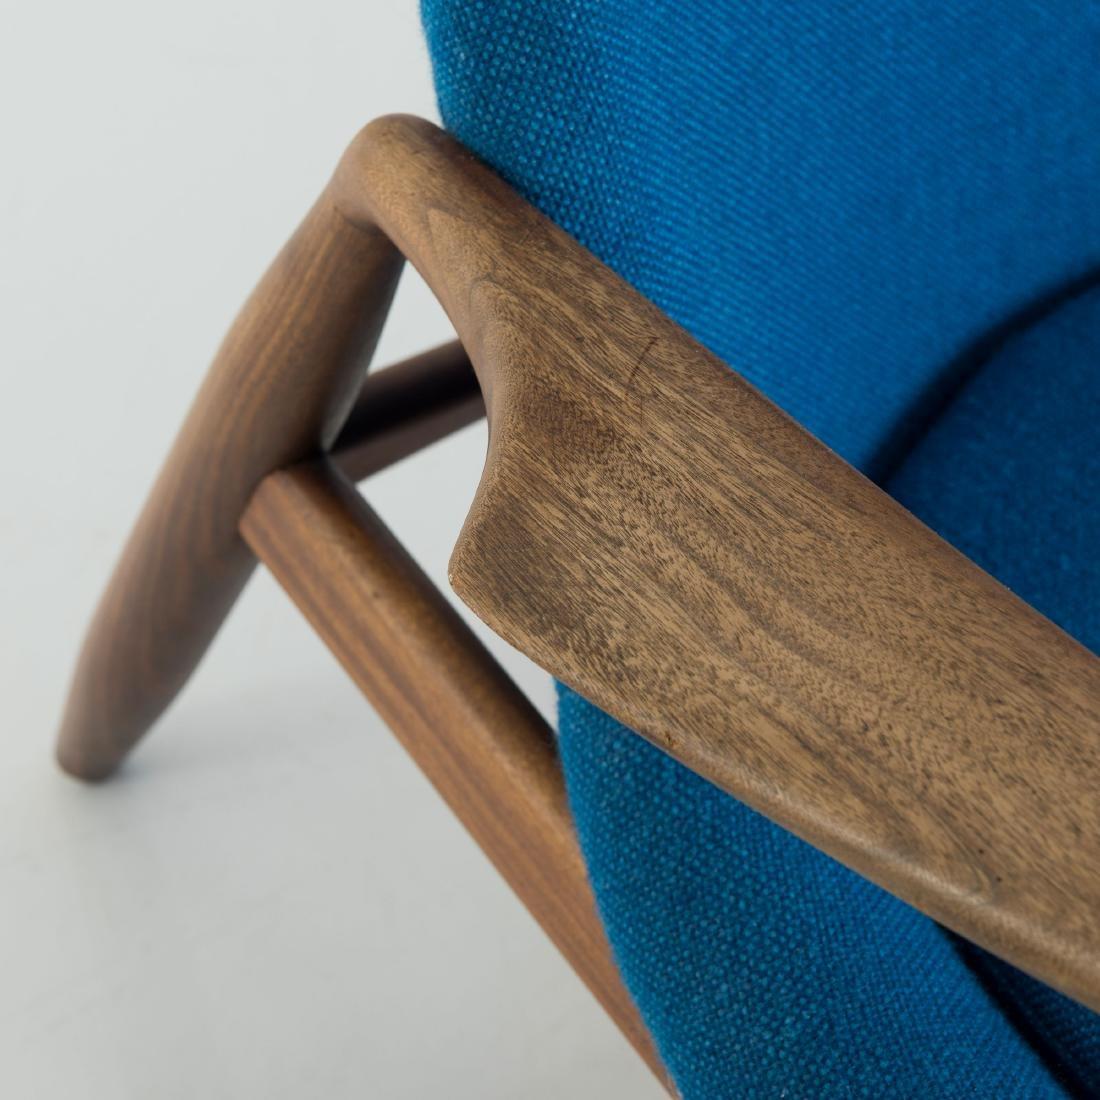 '800' - 'Highback Seal chair', c1956 - 2